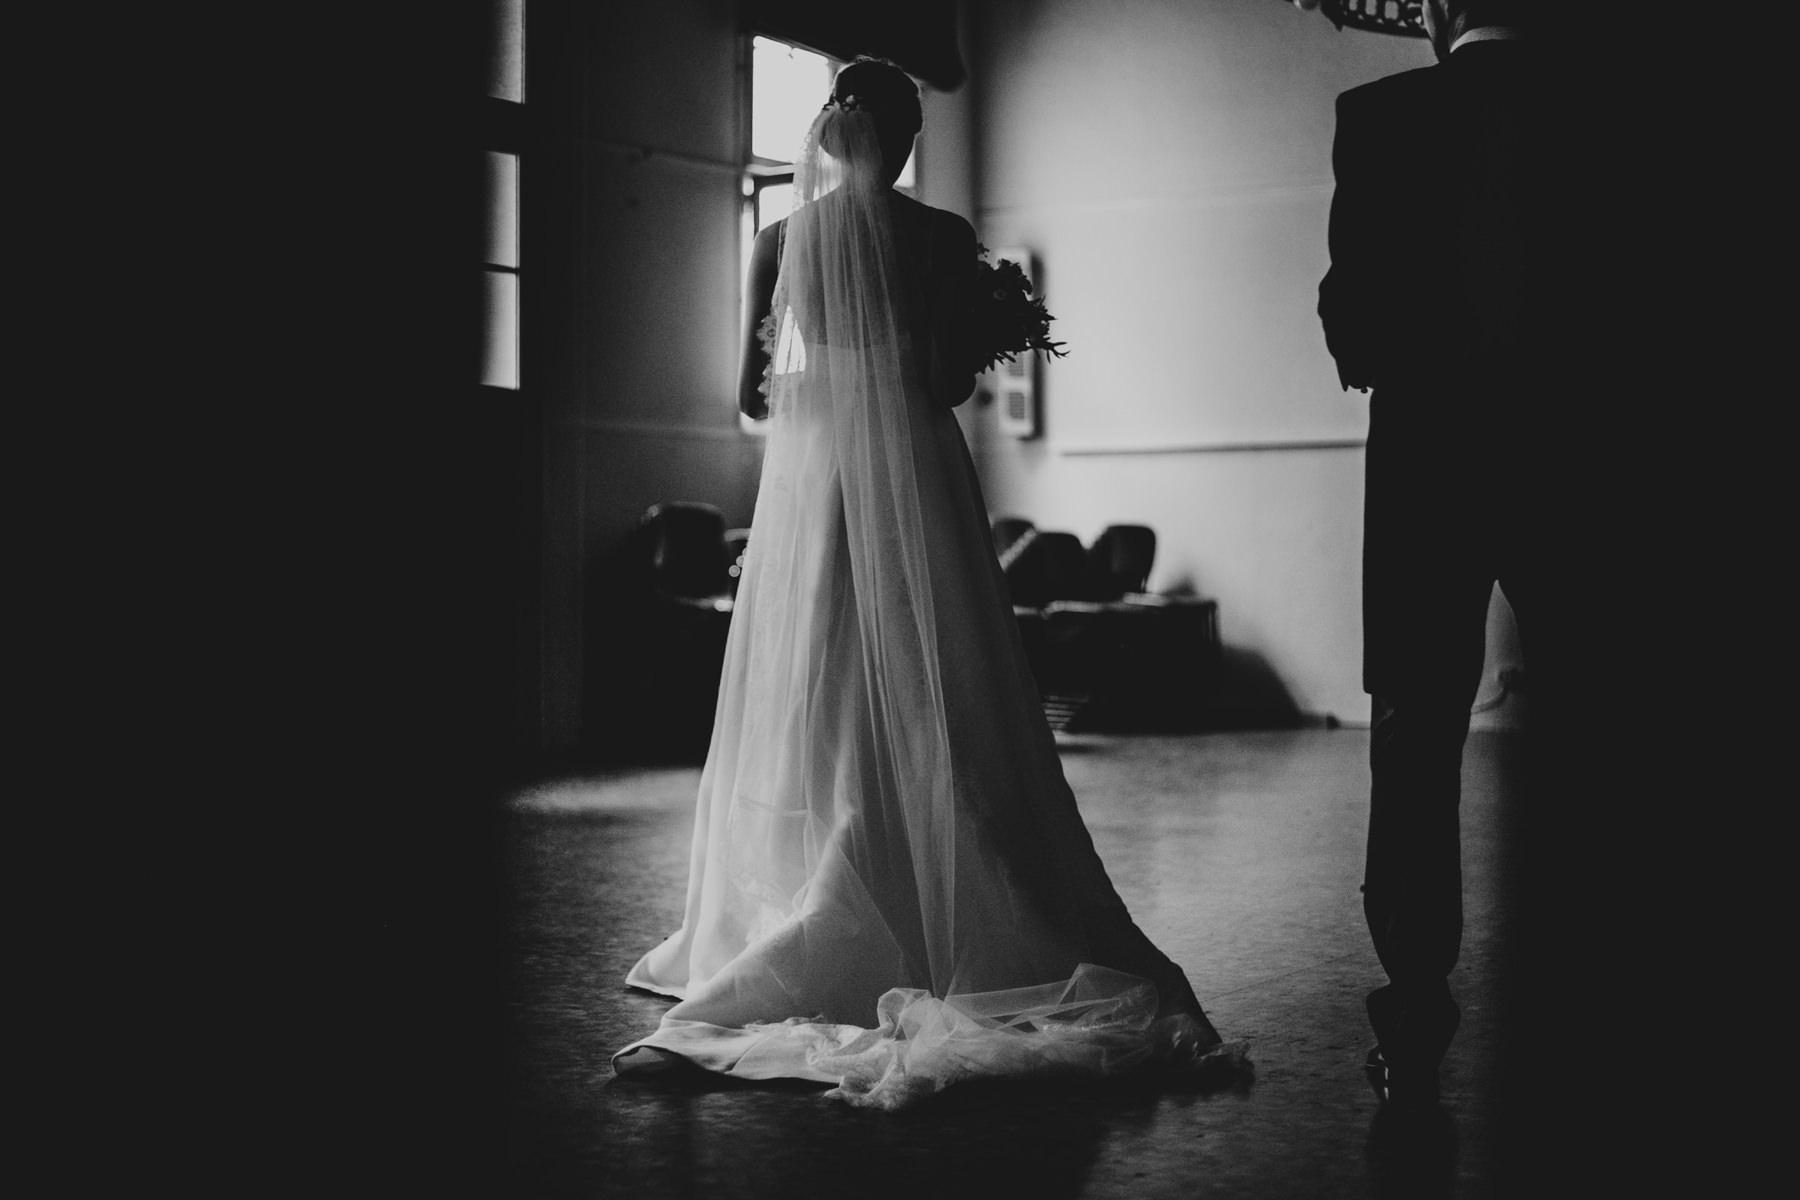 Wedding_Photography_Carlos_Hevia_Barcelona_Berlin_19.jpg